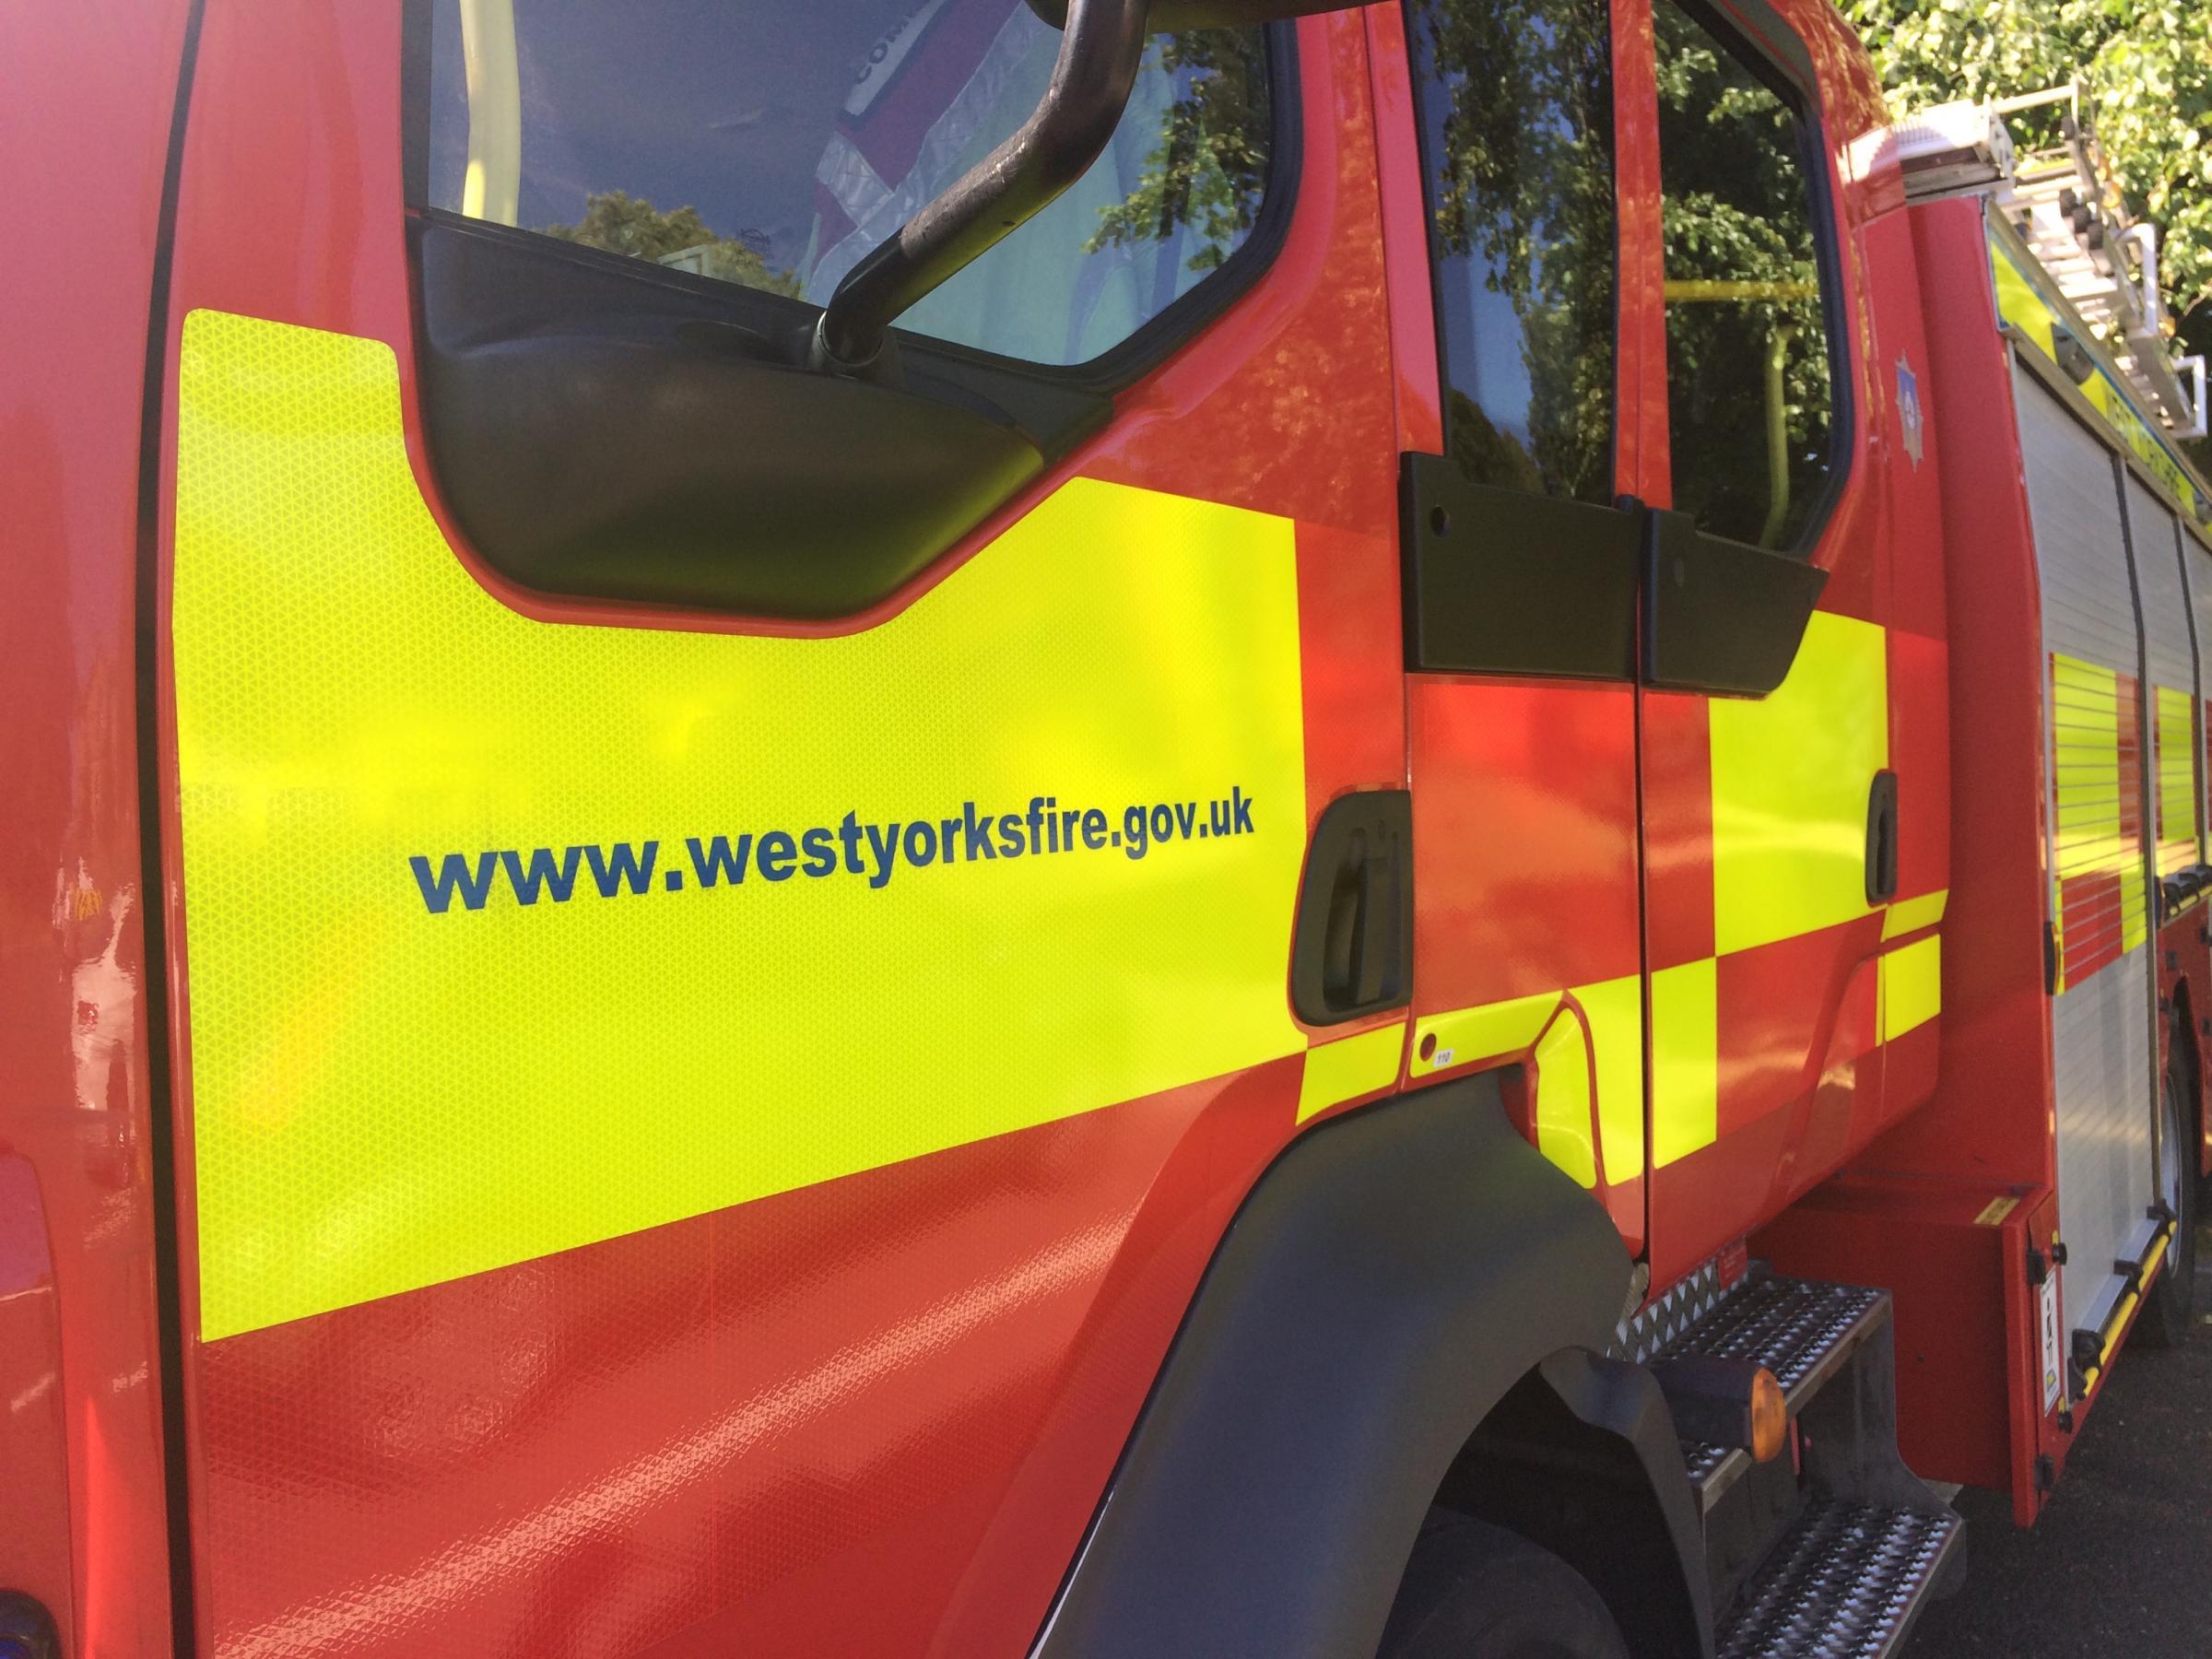 Update on disorder on Ullswater Crescent, Leeds